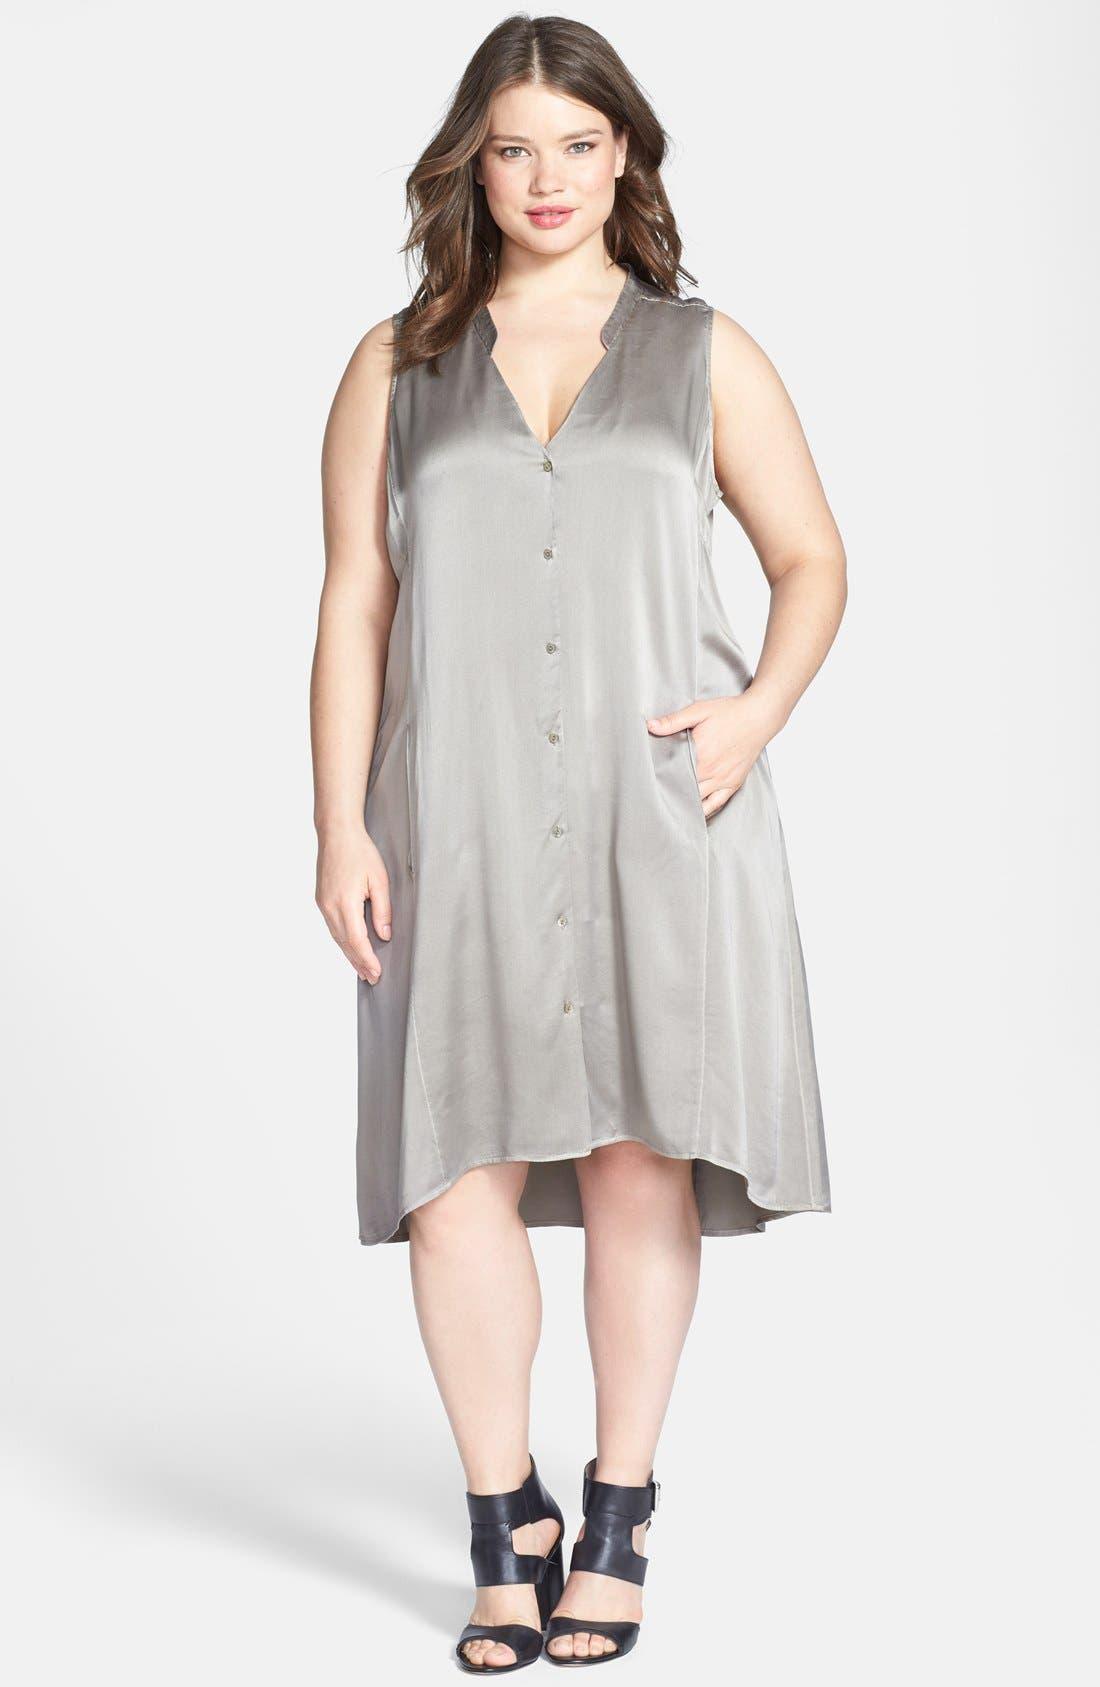 Alternate Image 1 Selected - Eileen Fisher Washed Silk Charmeuse Mandarin Collar V-Neck Shift Dress (Plus Size)